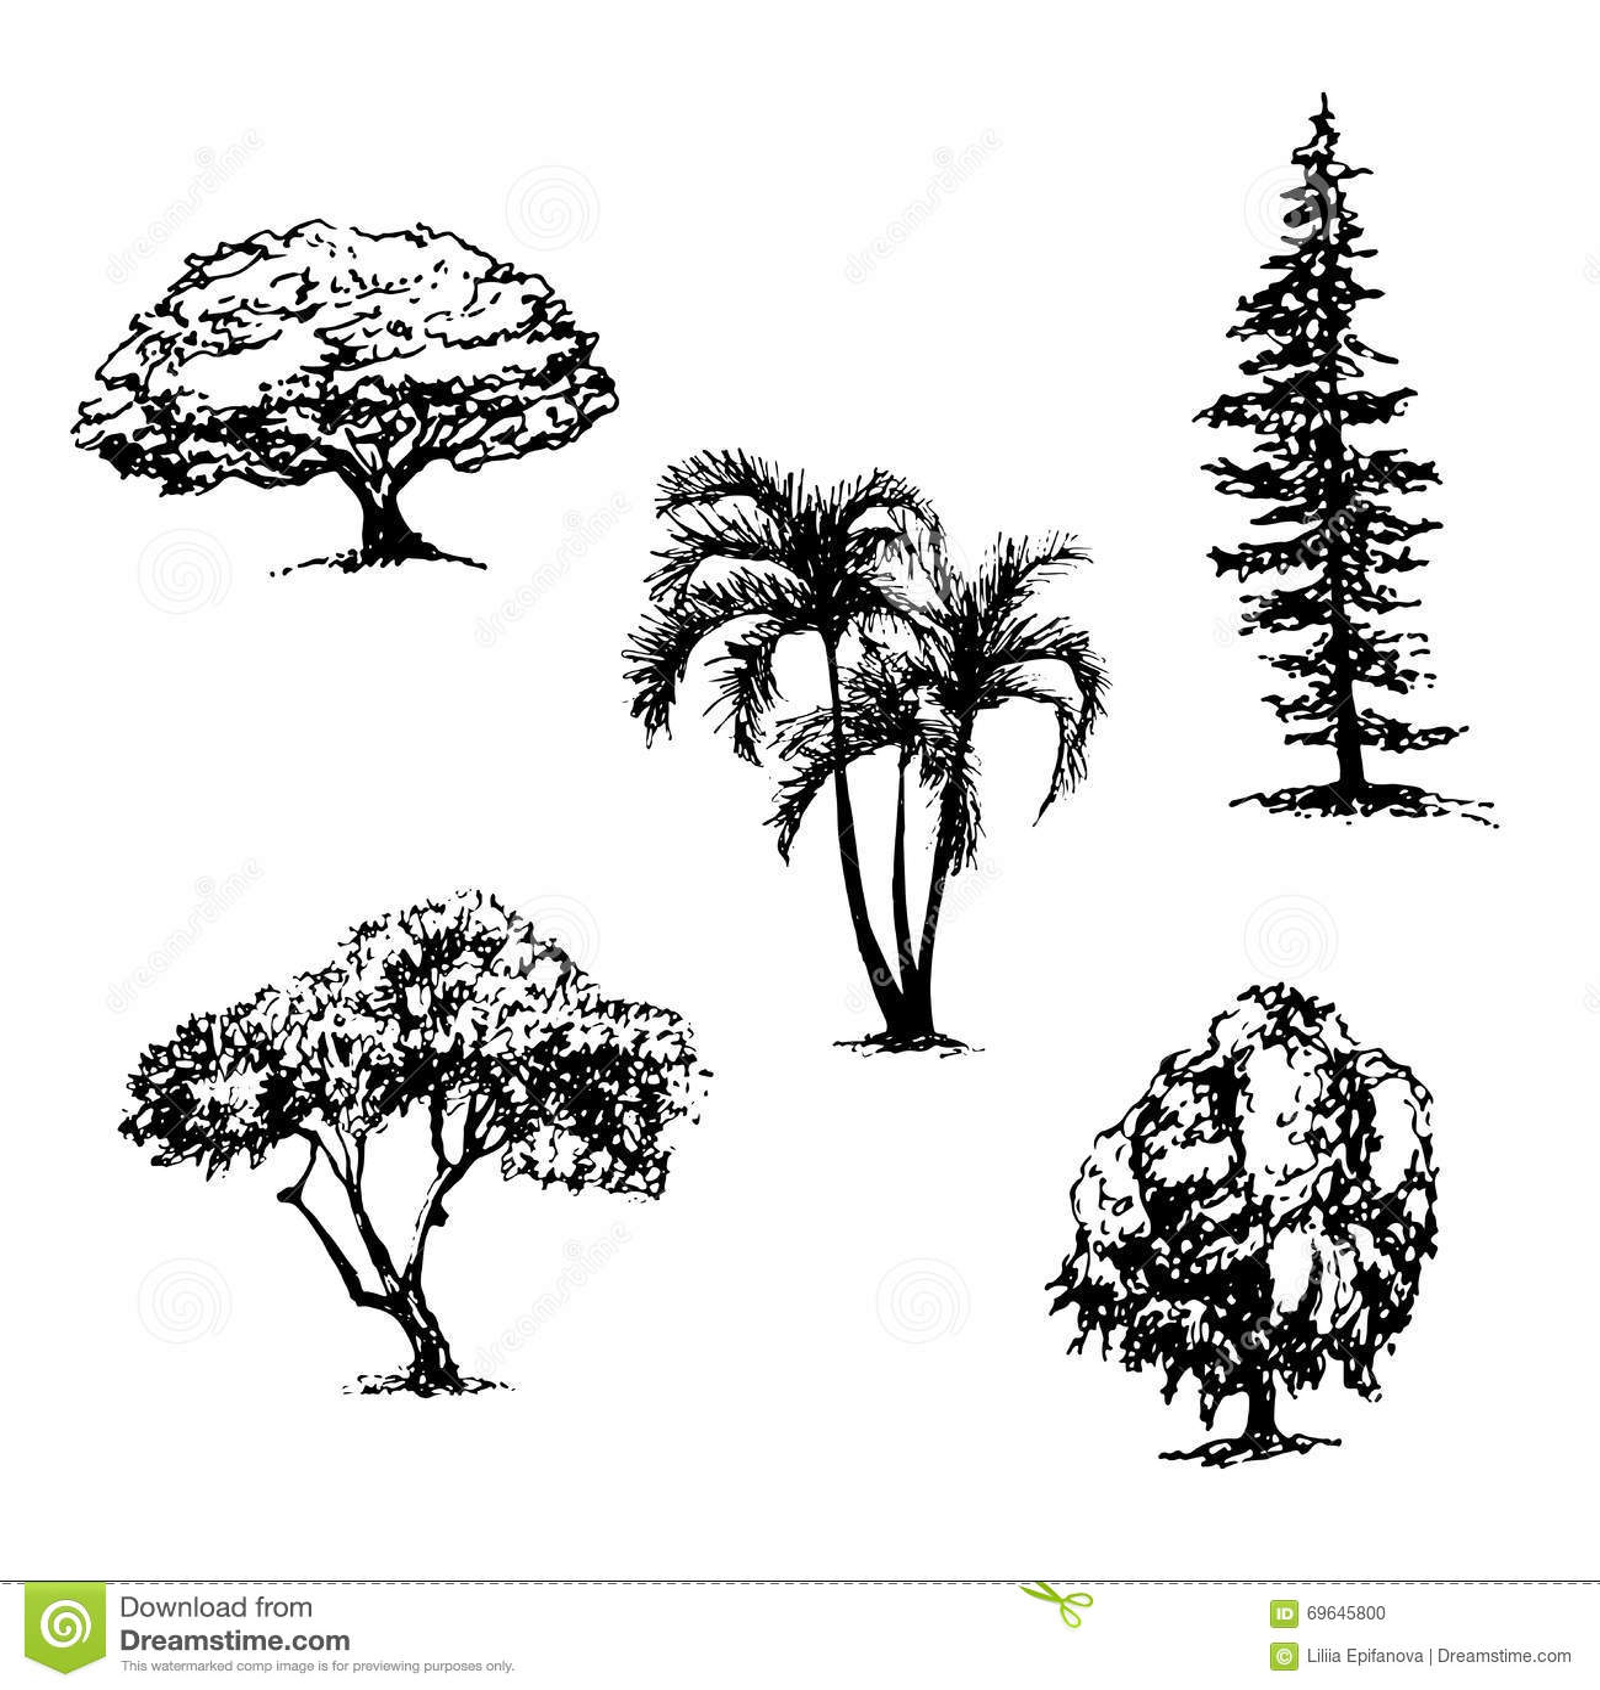 Collection de dessin d 39 illustration de croquis de 5 arbres - Croquis arbre ...